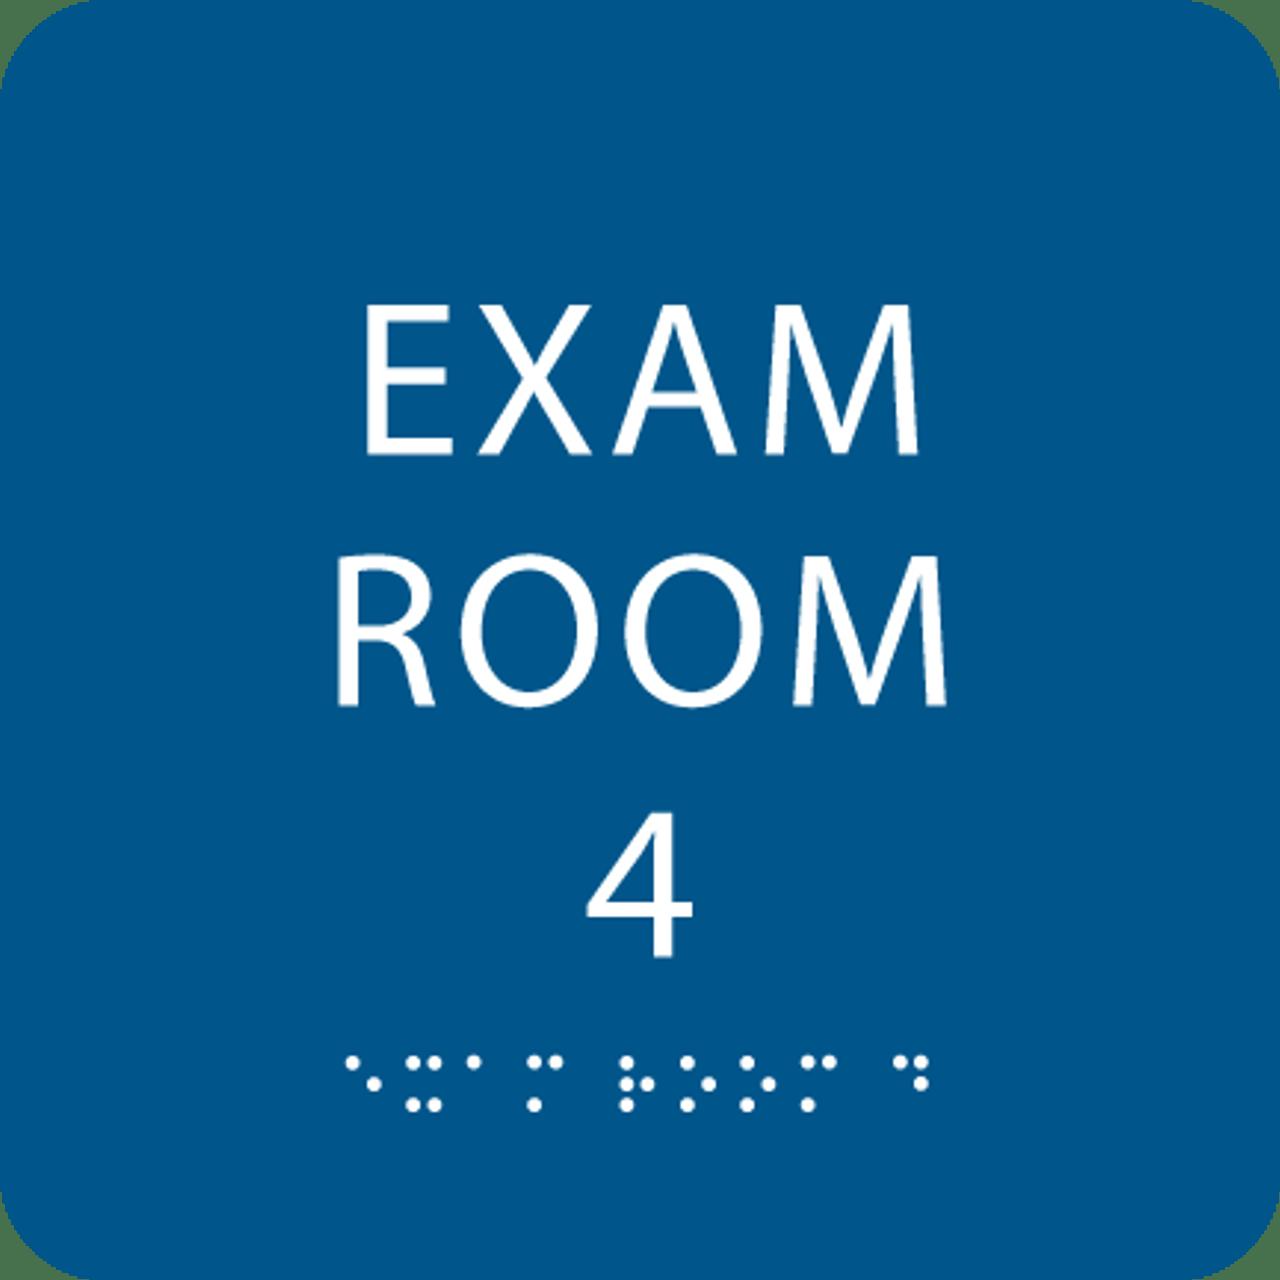 Royal Blue Exam Room 4 ADA Sign